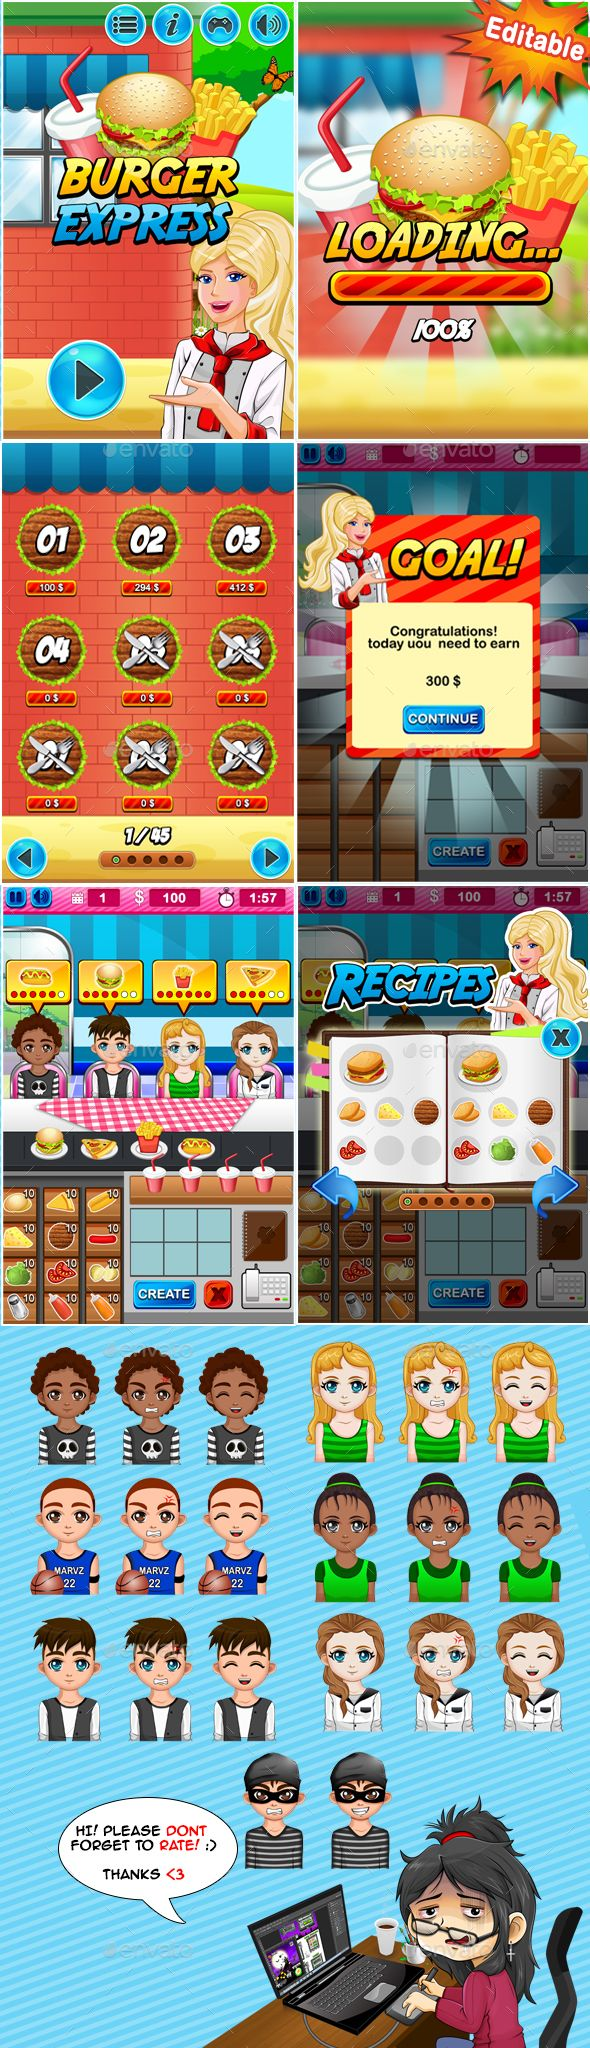 2D Mobile Game Kit - Burger Express - Game Kits | DOWNLOAD: https://graphicriver.net/item/2d-mobile-game-kit-burger-express/19998872?ref=sinzo #Game #Assets